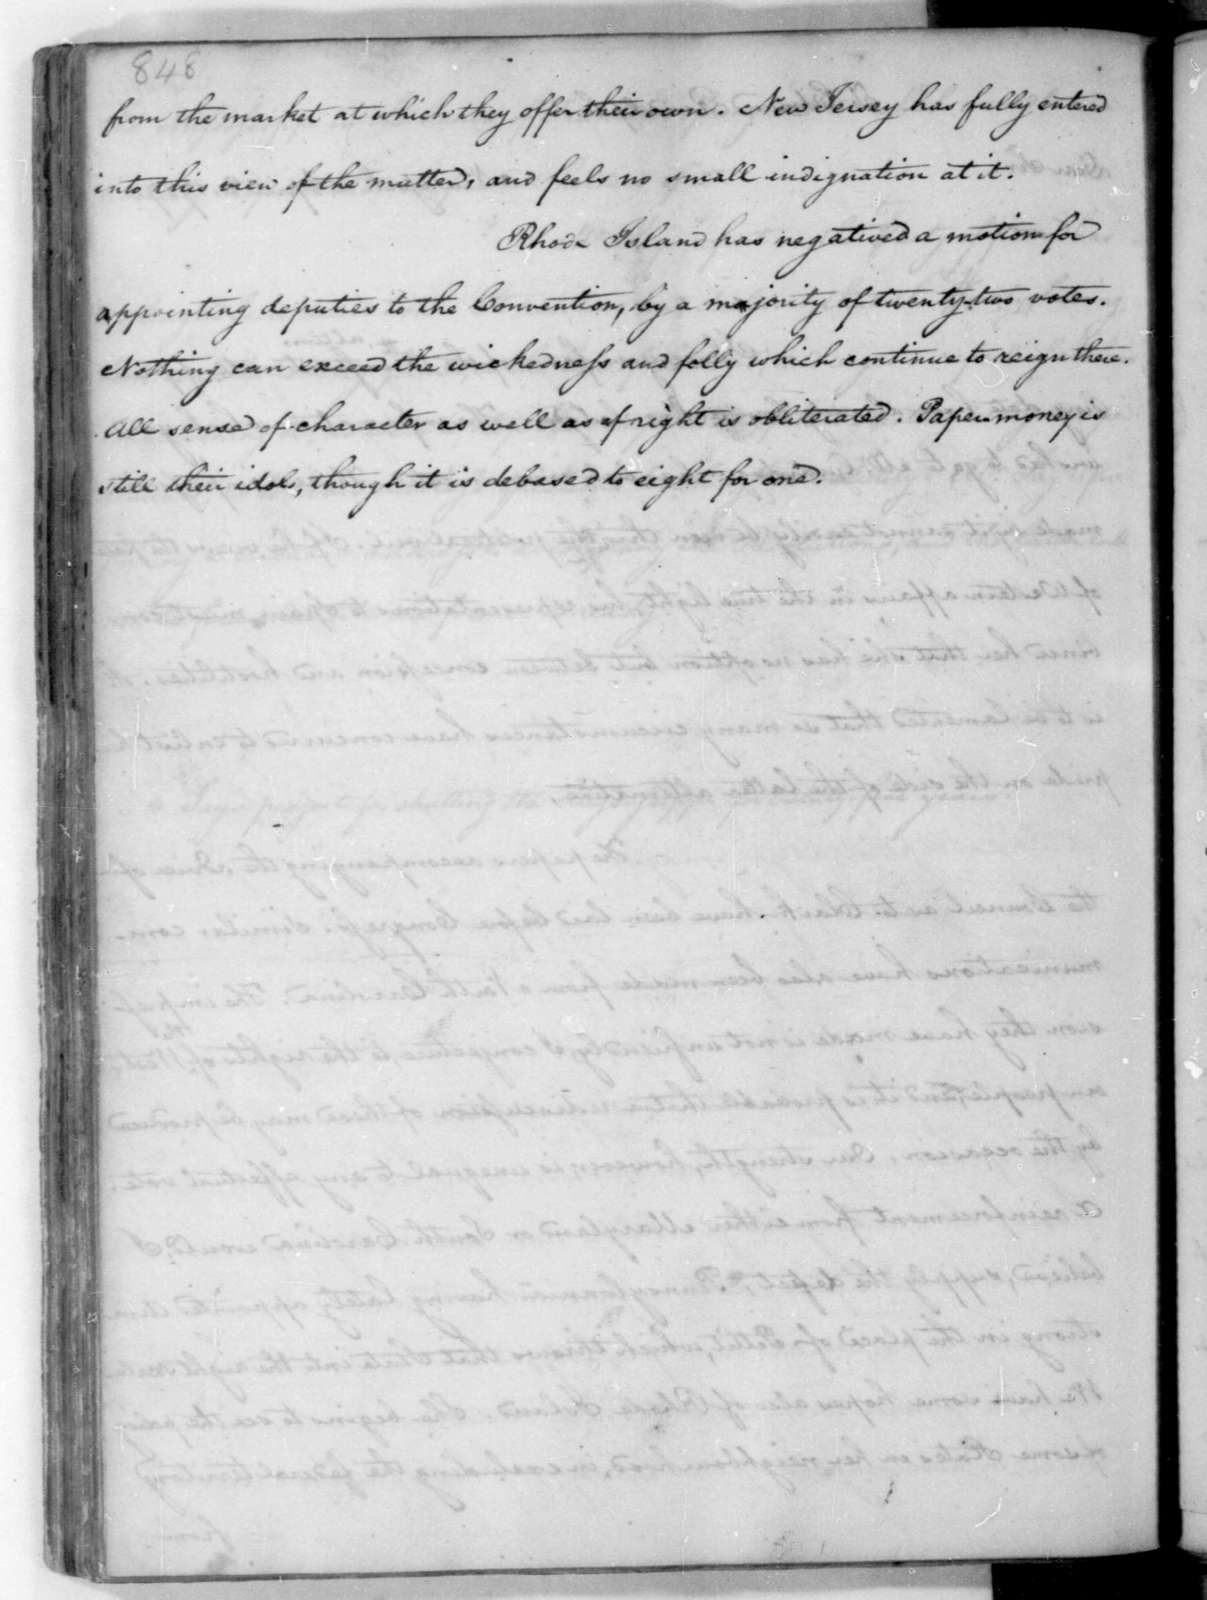 James Madison to Edmund Randolph, April 2, 1787.